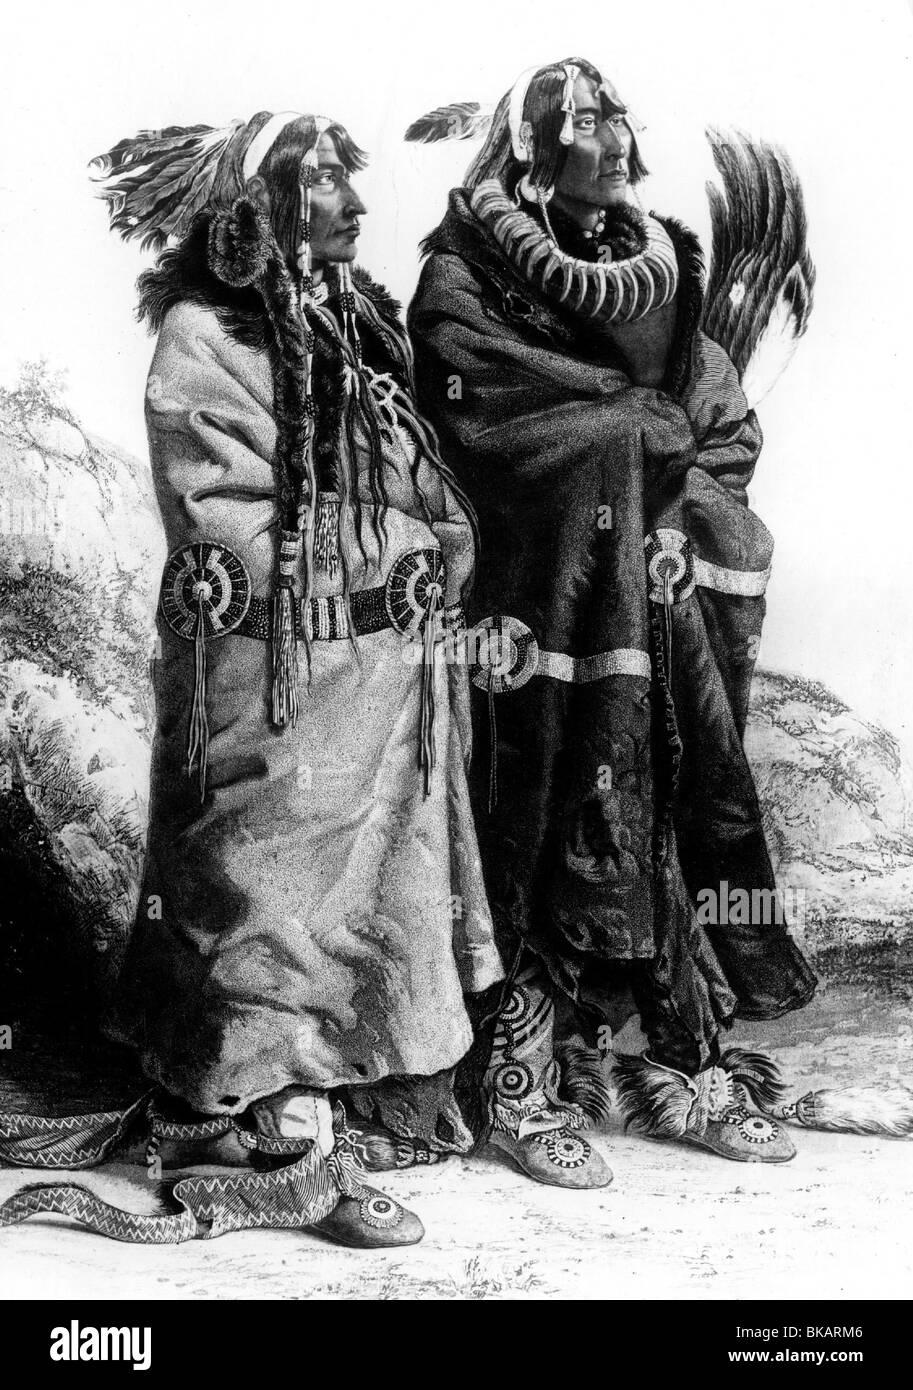 indianer gravur stockfotos amp indianer gravur bilder alamy